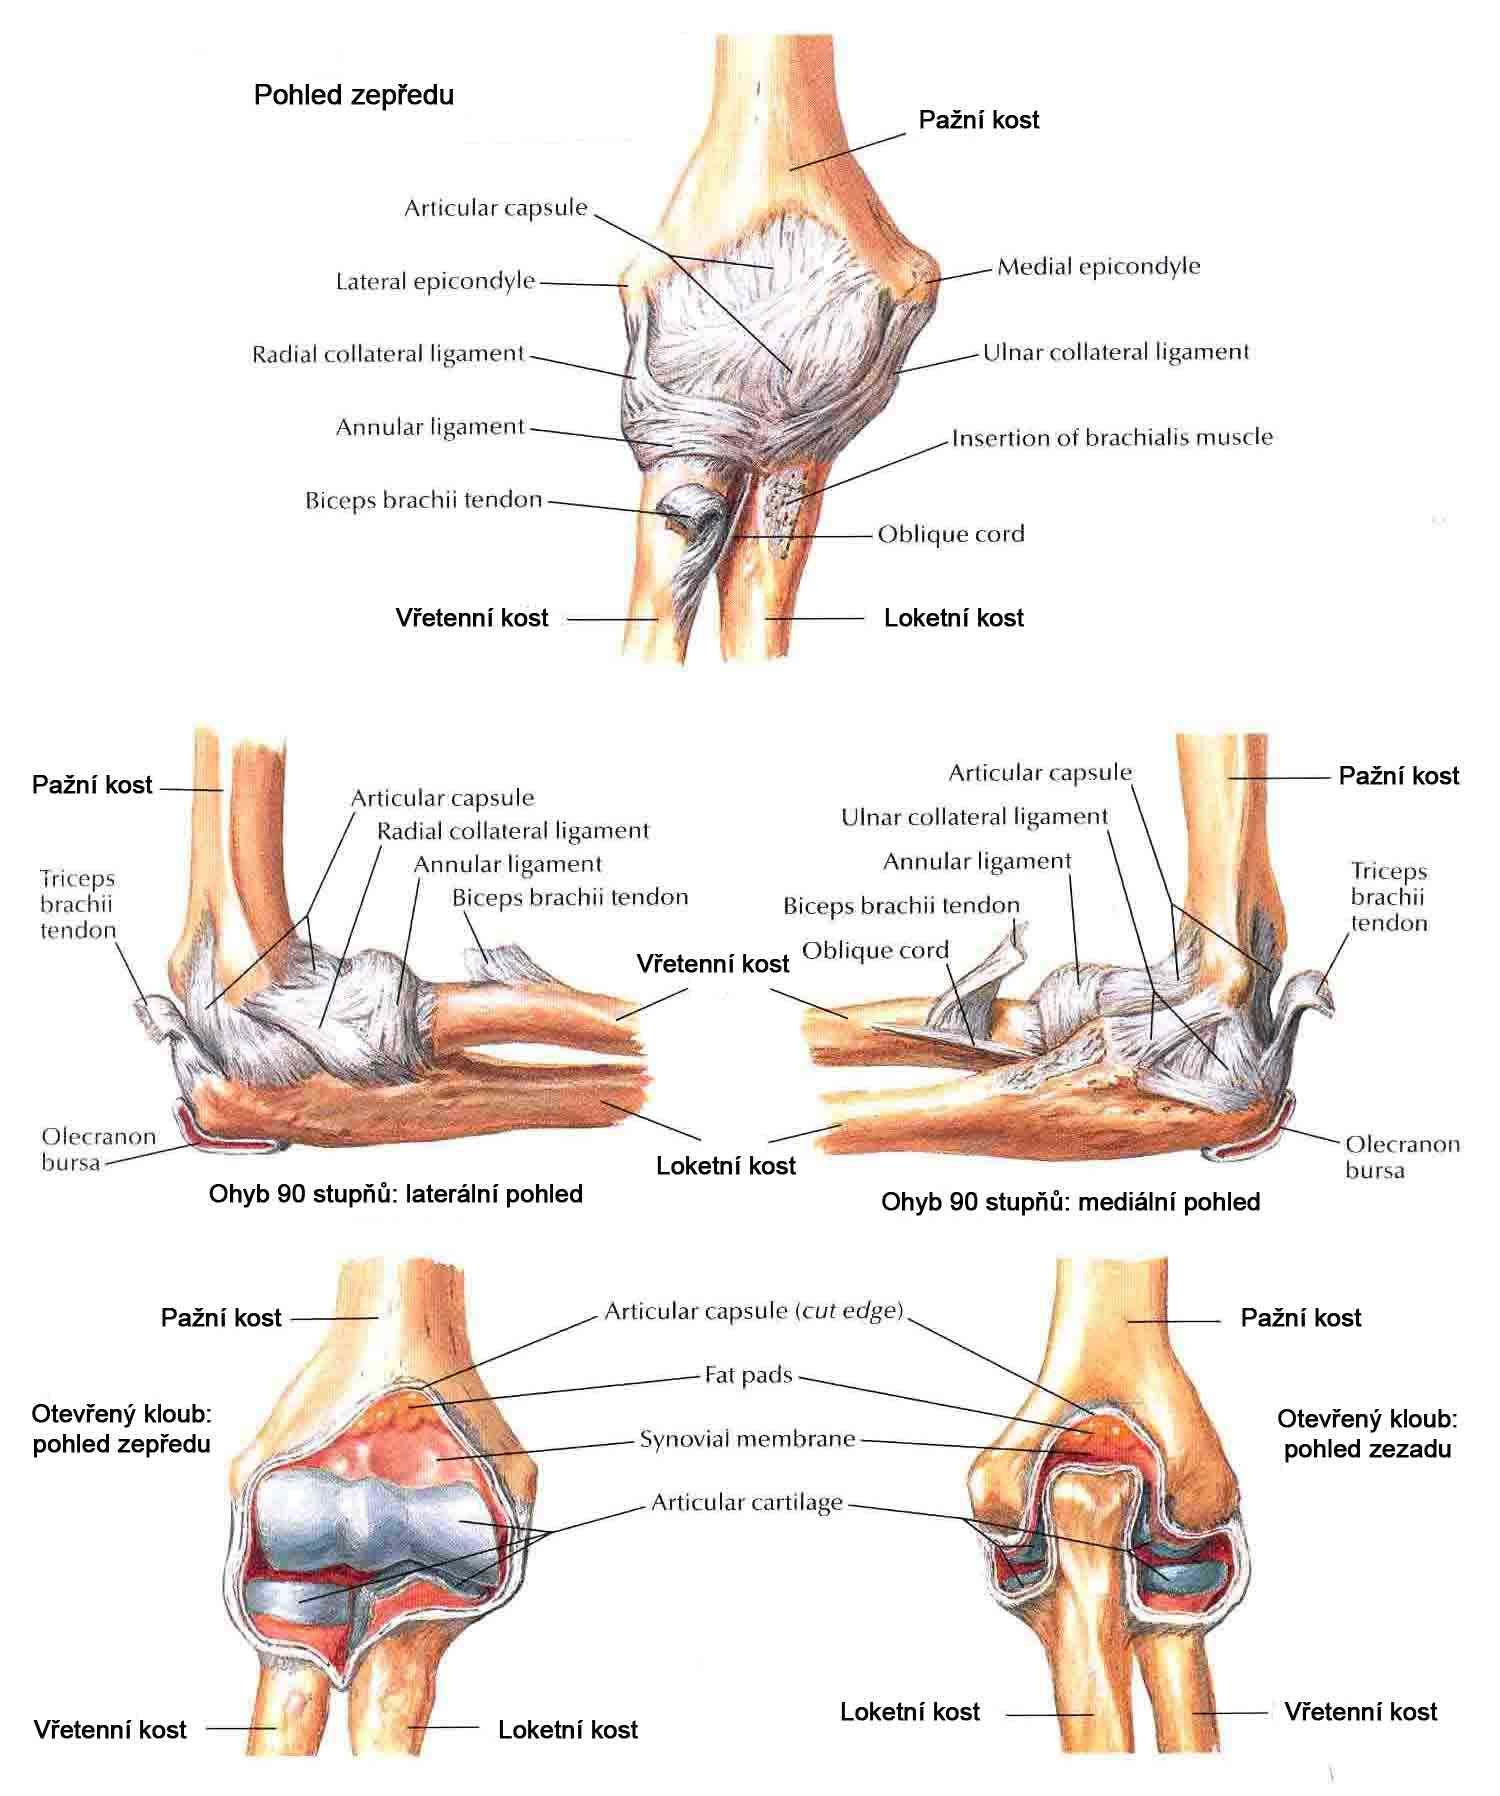 Uncovertebral joint anatomy